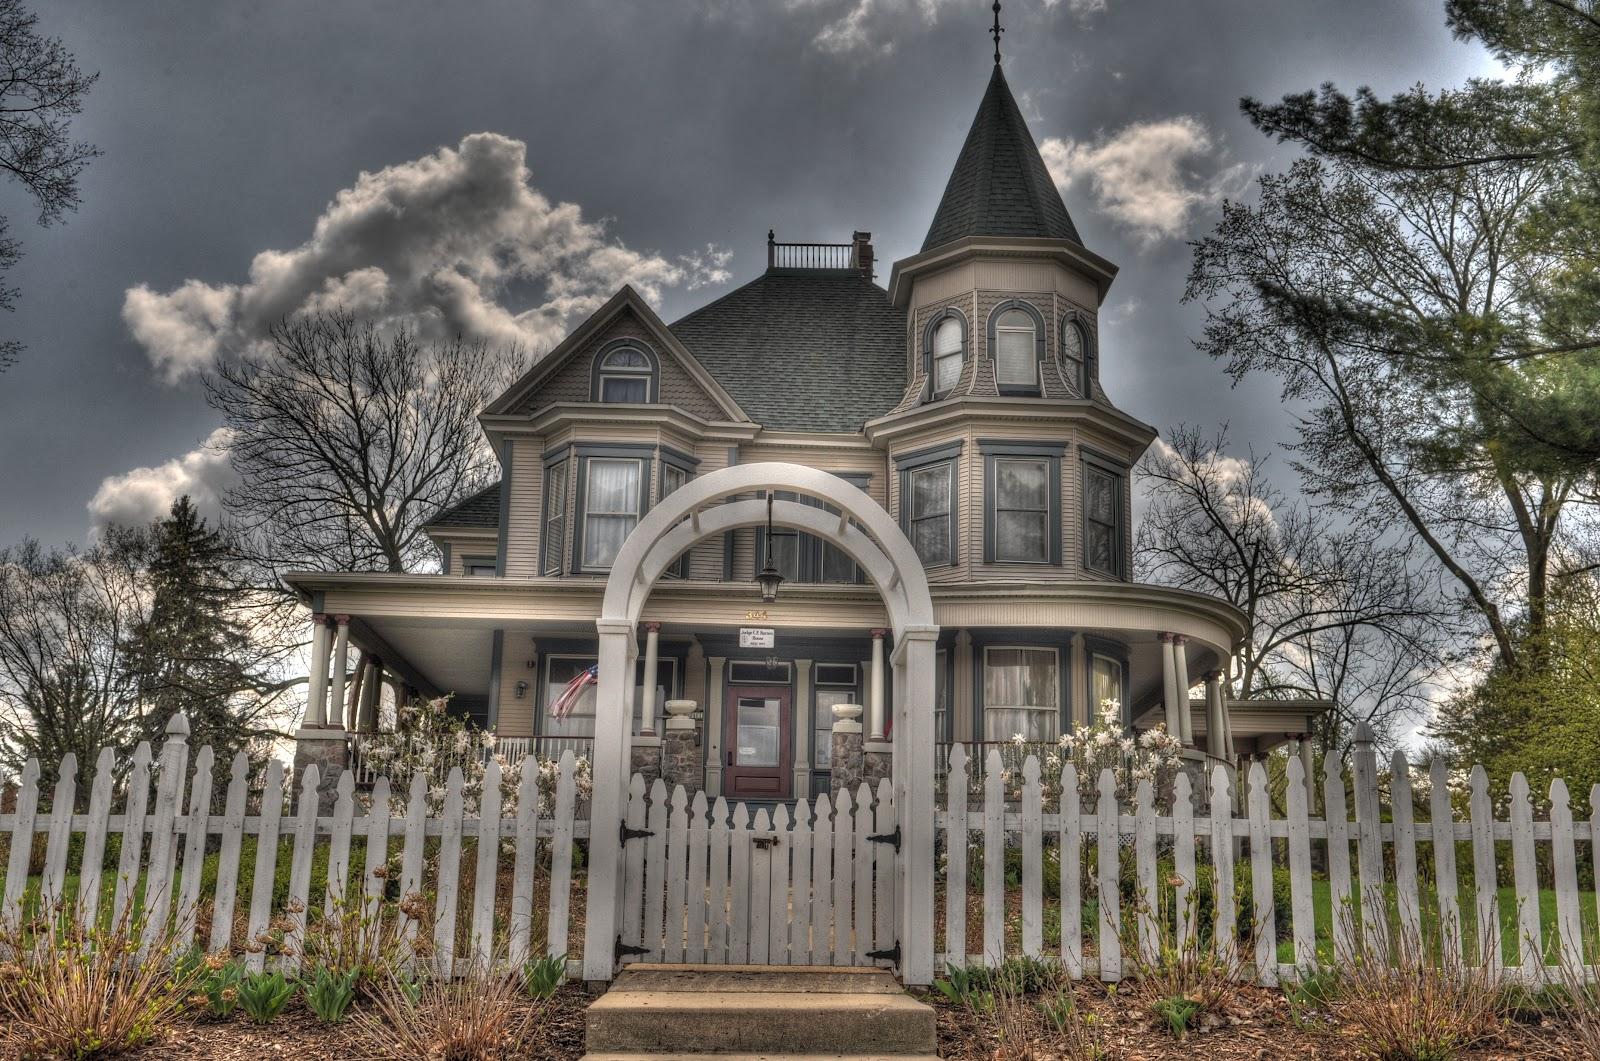 Image of the house where  Groundhog Day  was filmed - via  Google .